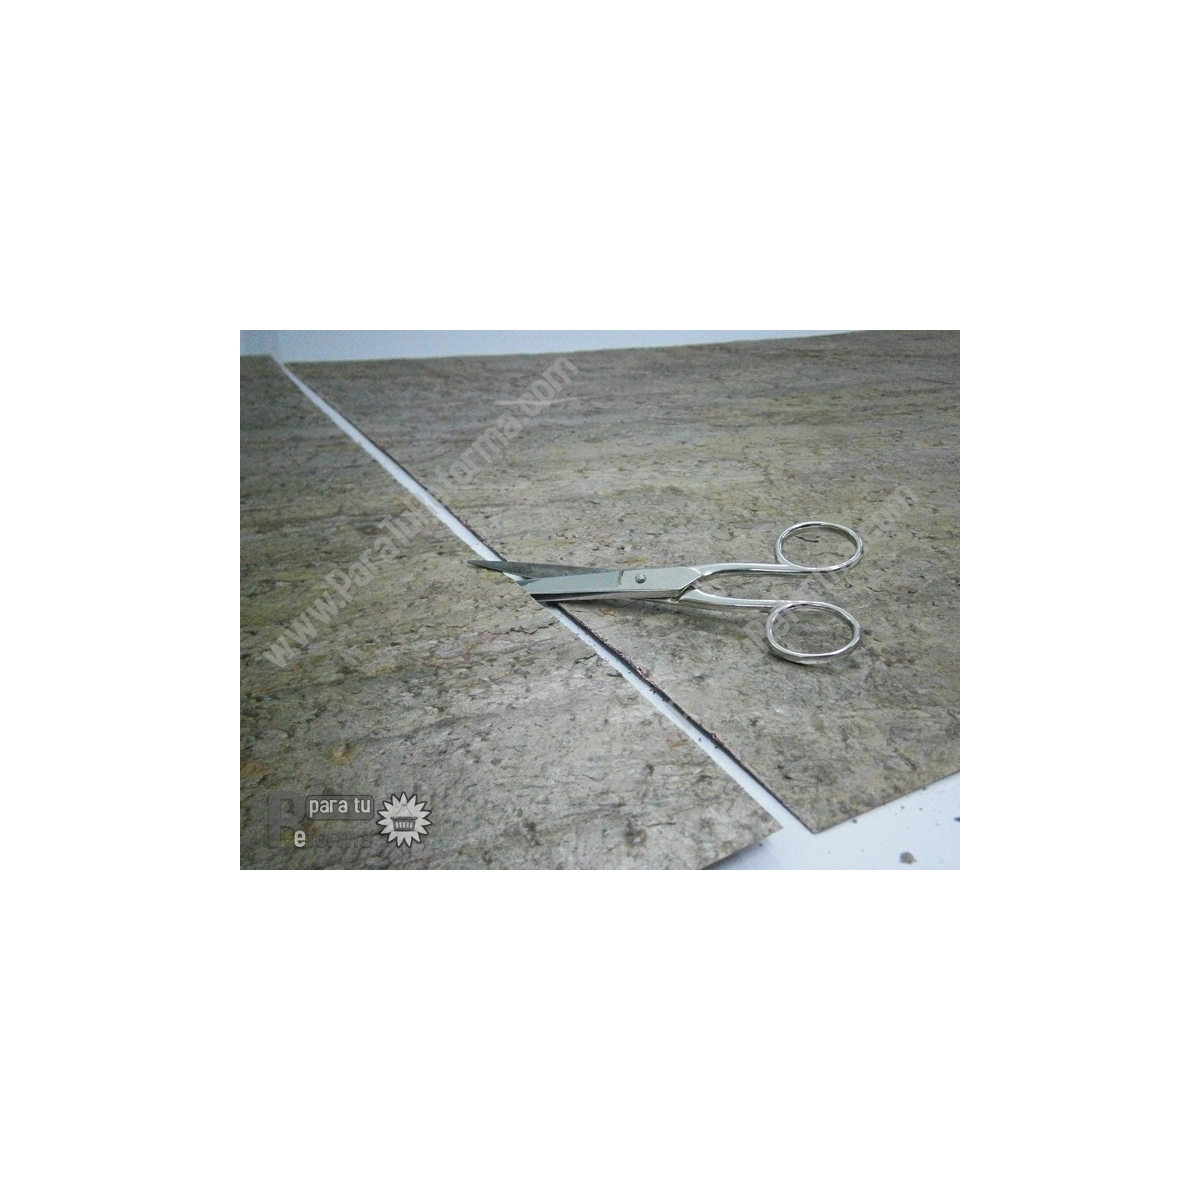 Pizarra natural flexible FS6011 / FT3011 - Revestimiento con Pizarra natural flexible